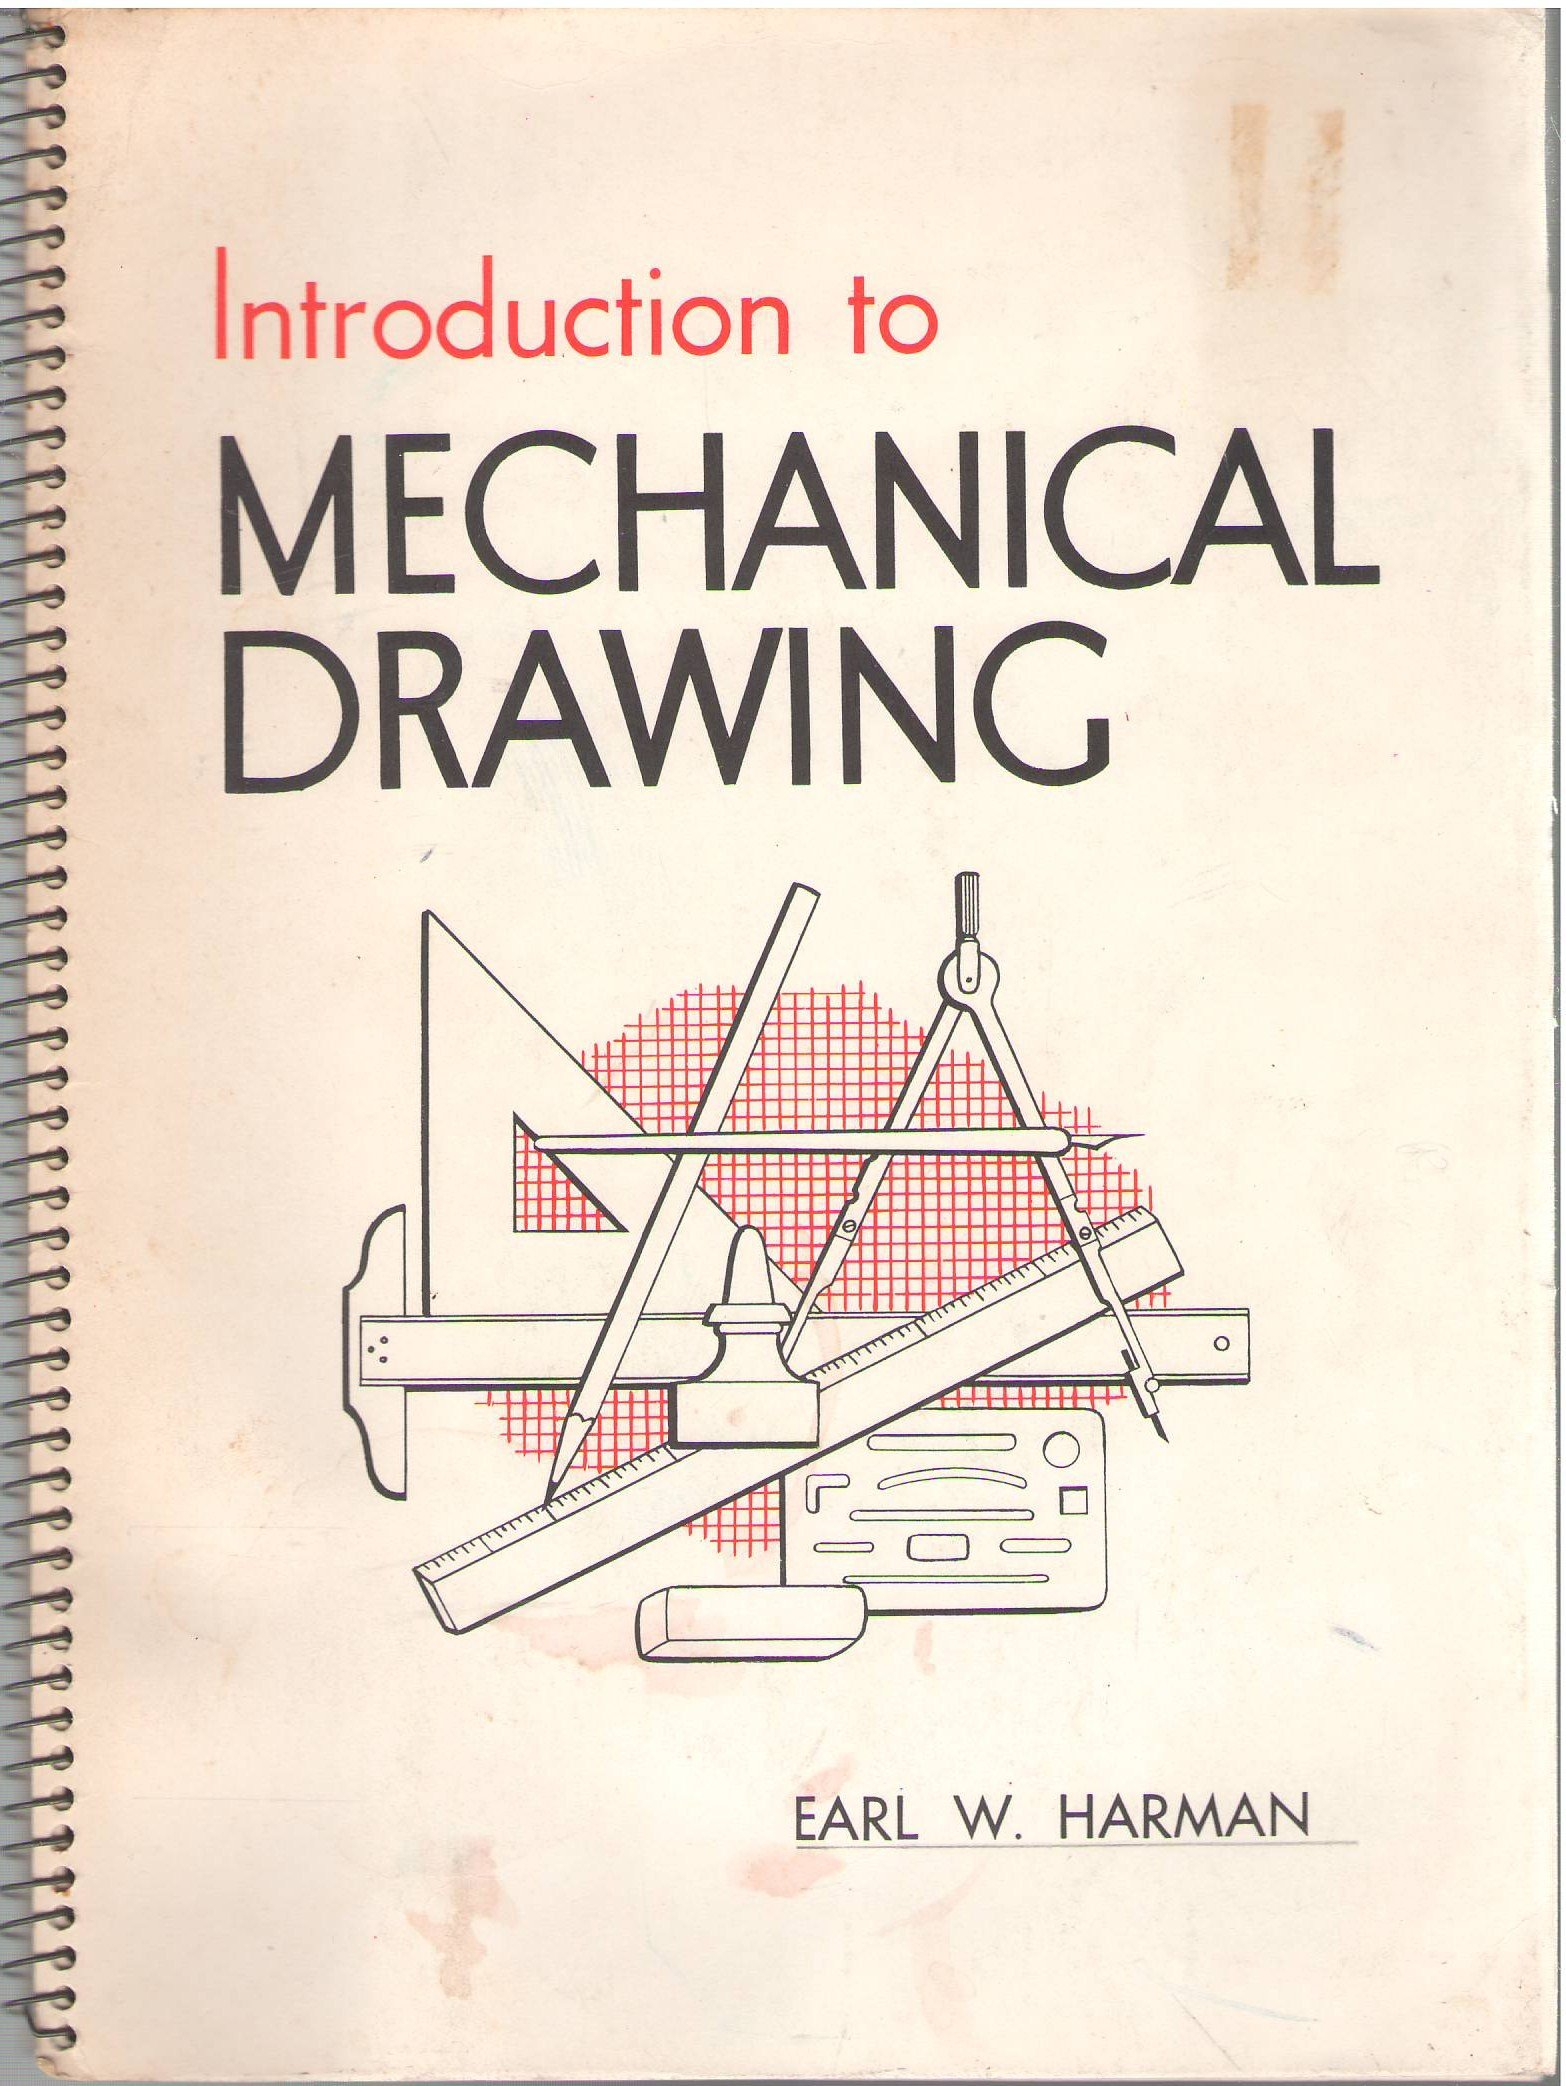 Introduction to mechanical drawing: Earl W Harman: Amazon